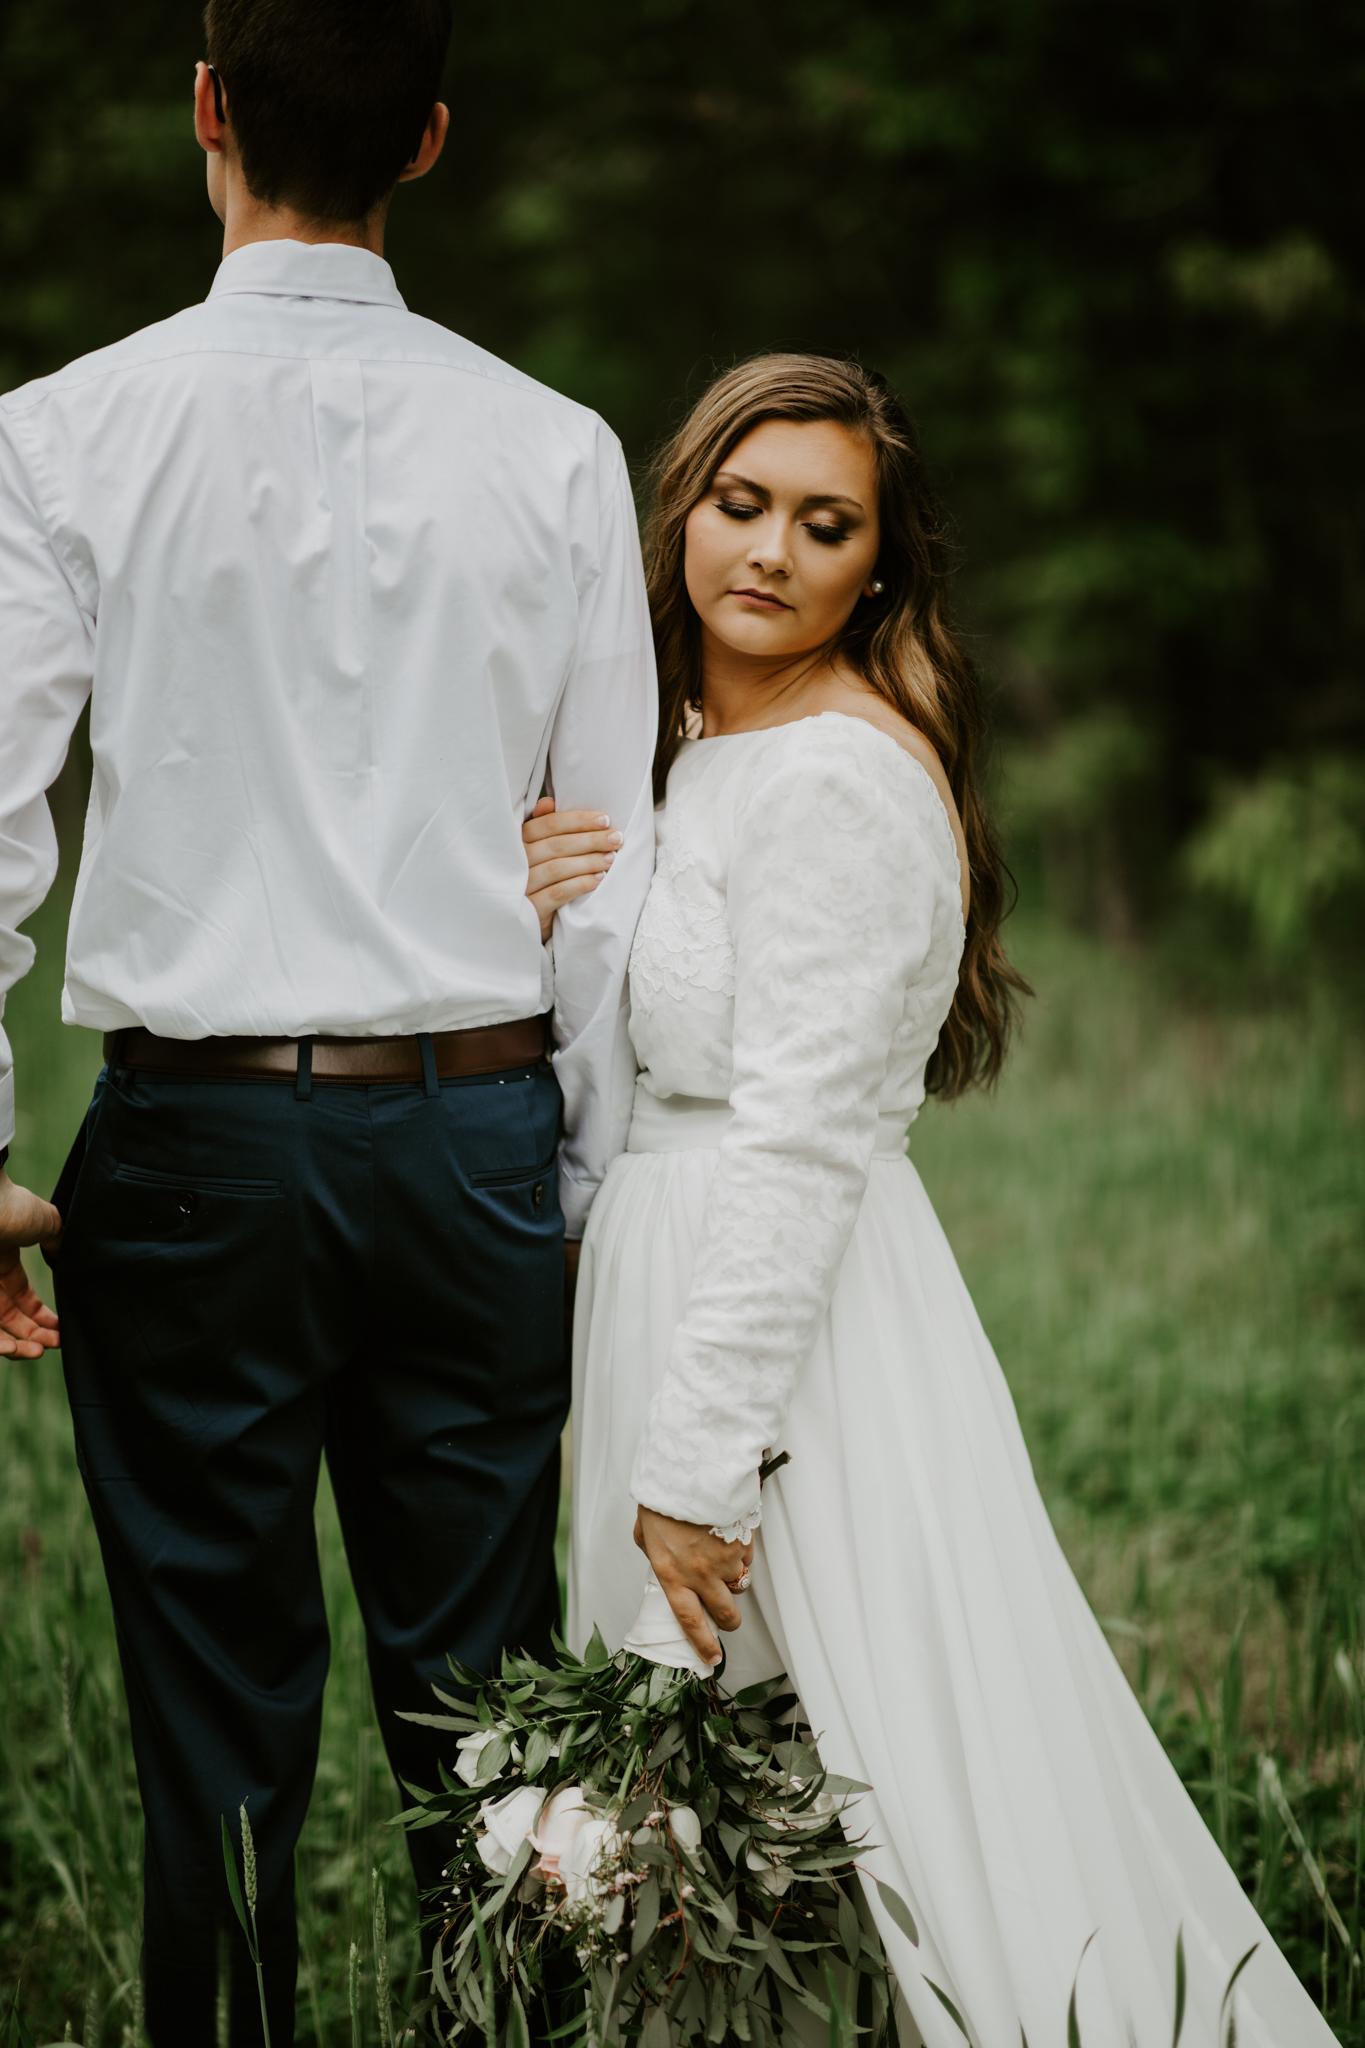 Lacey-Joe-Chattanooga-Nashville-Tennessee-Wedding-Elopement-Photographer-175.jpg